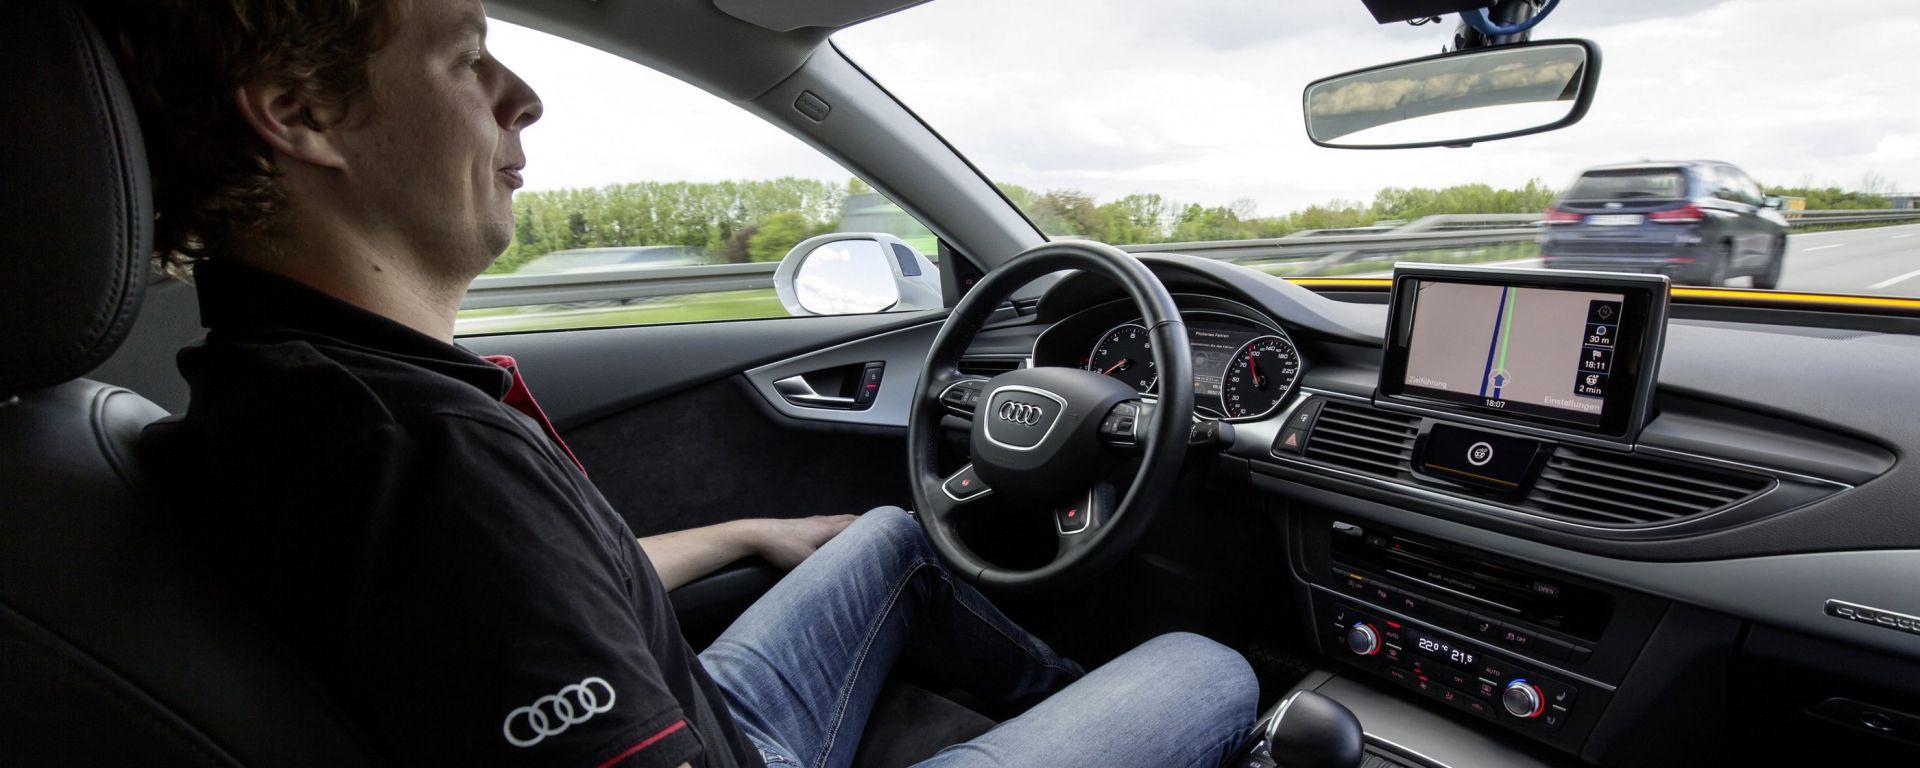 Guida autonoma: la Germania vuole la scatola nera